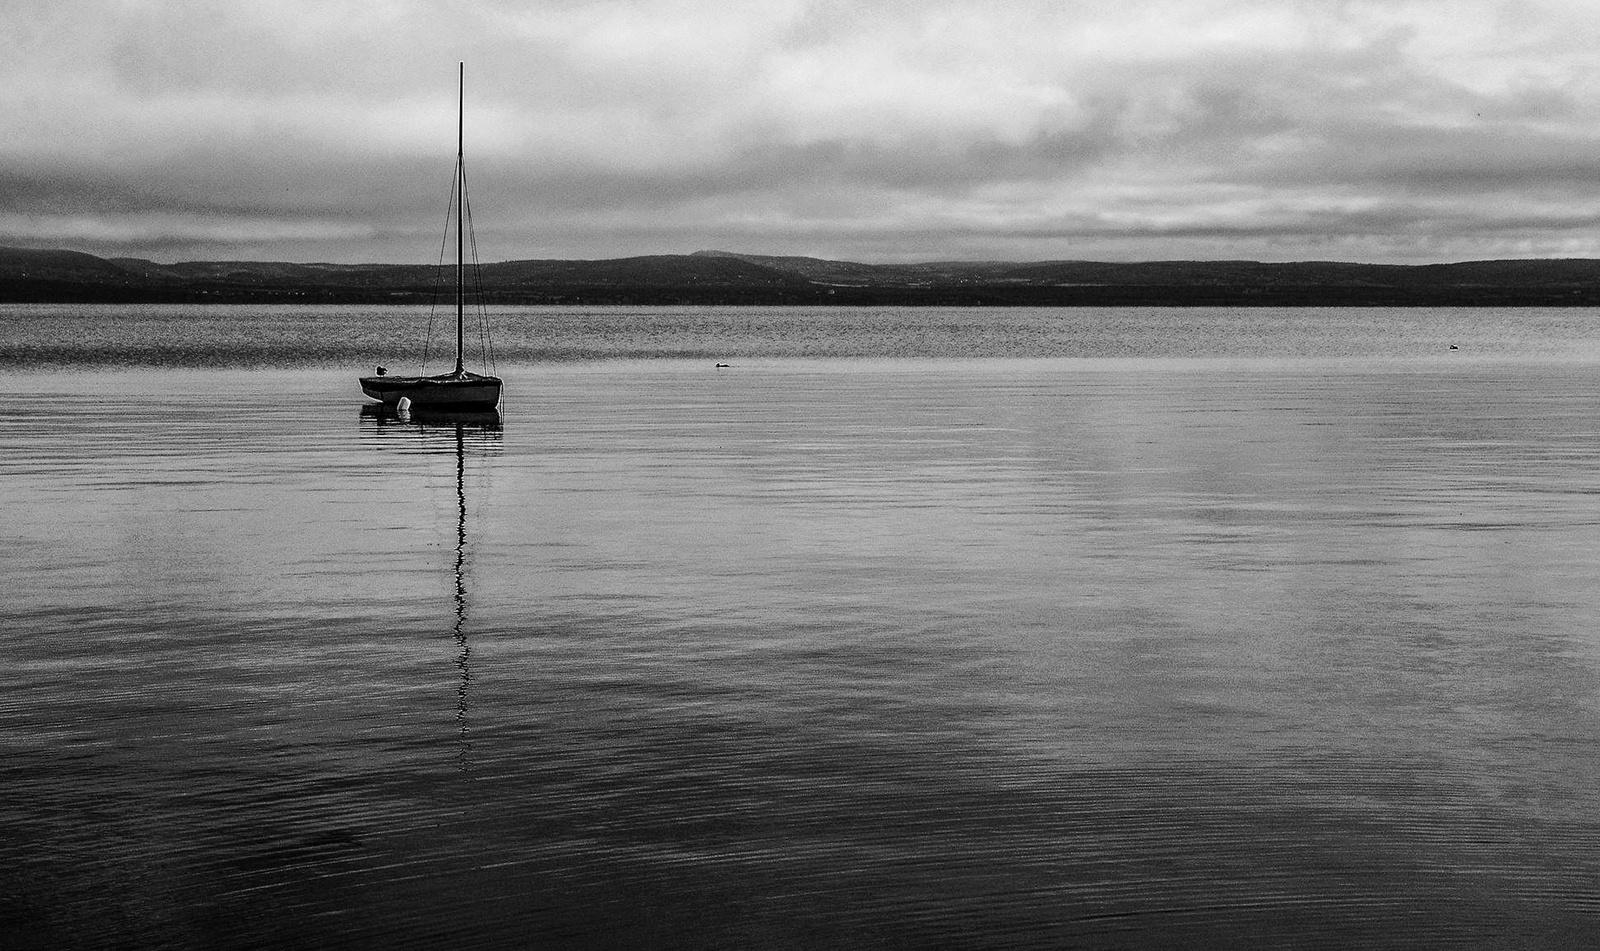 Magányos hajó reggelFF